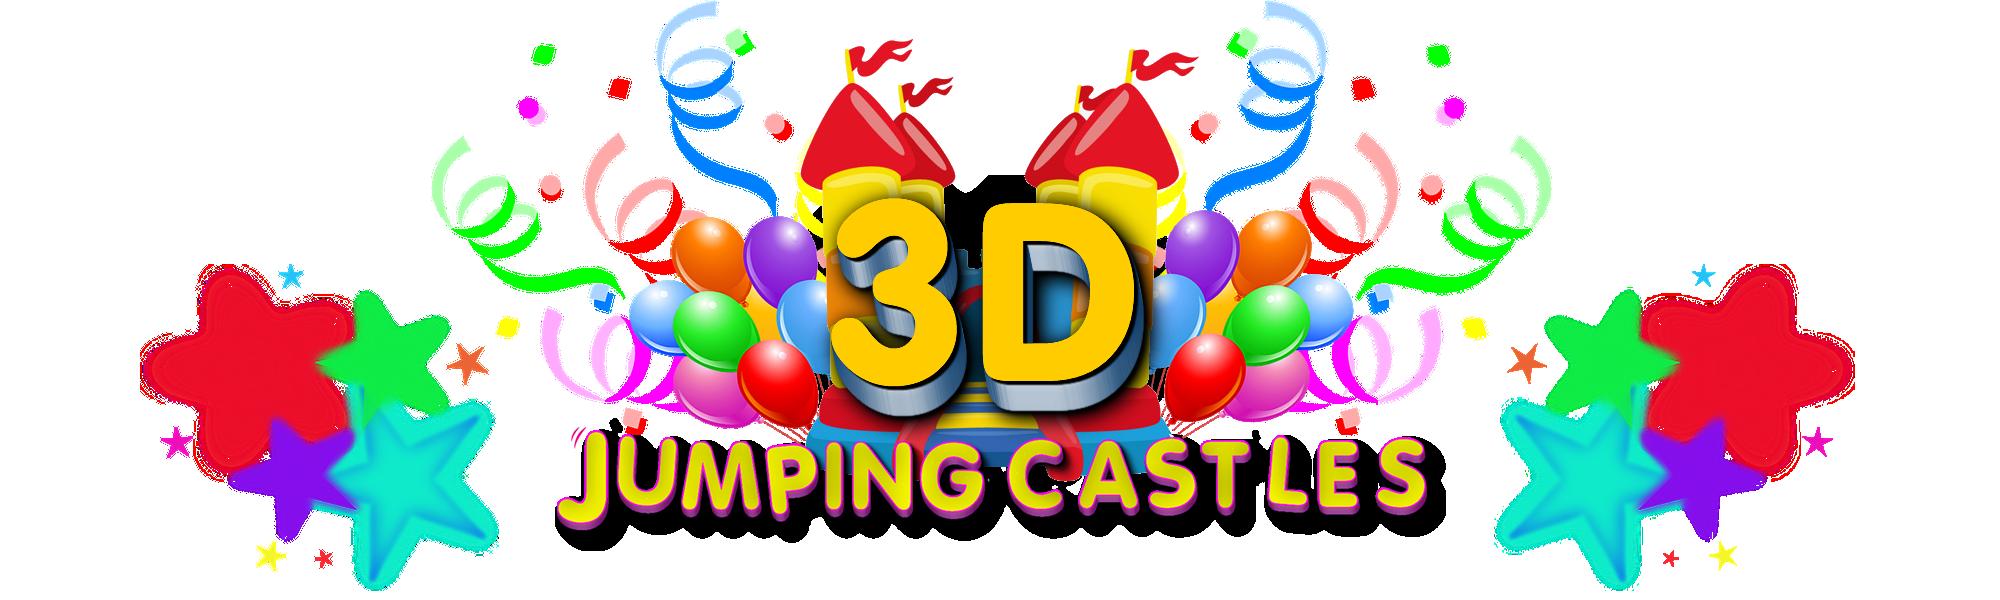 3D Jumping Castles